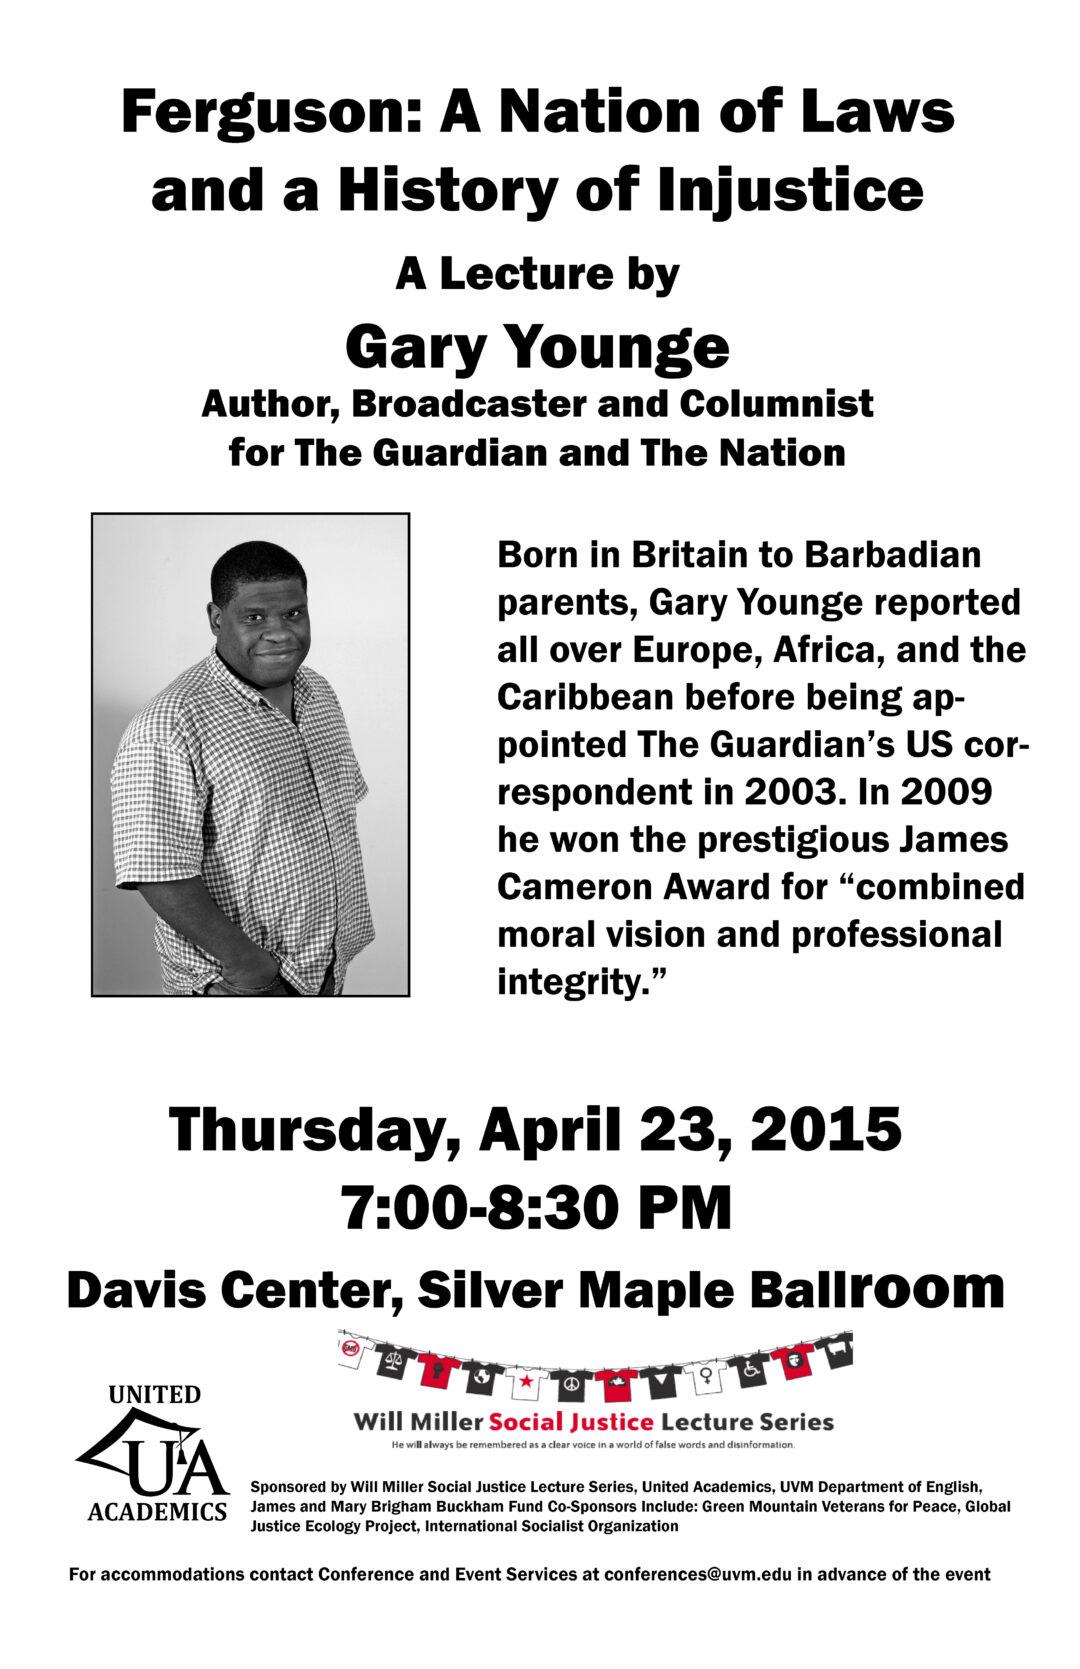 Gary Younge